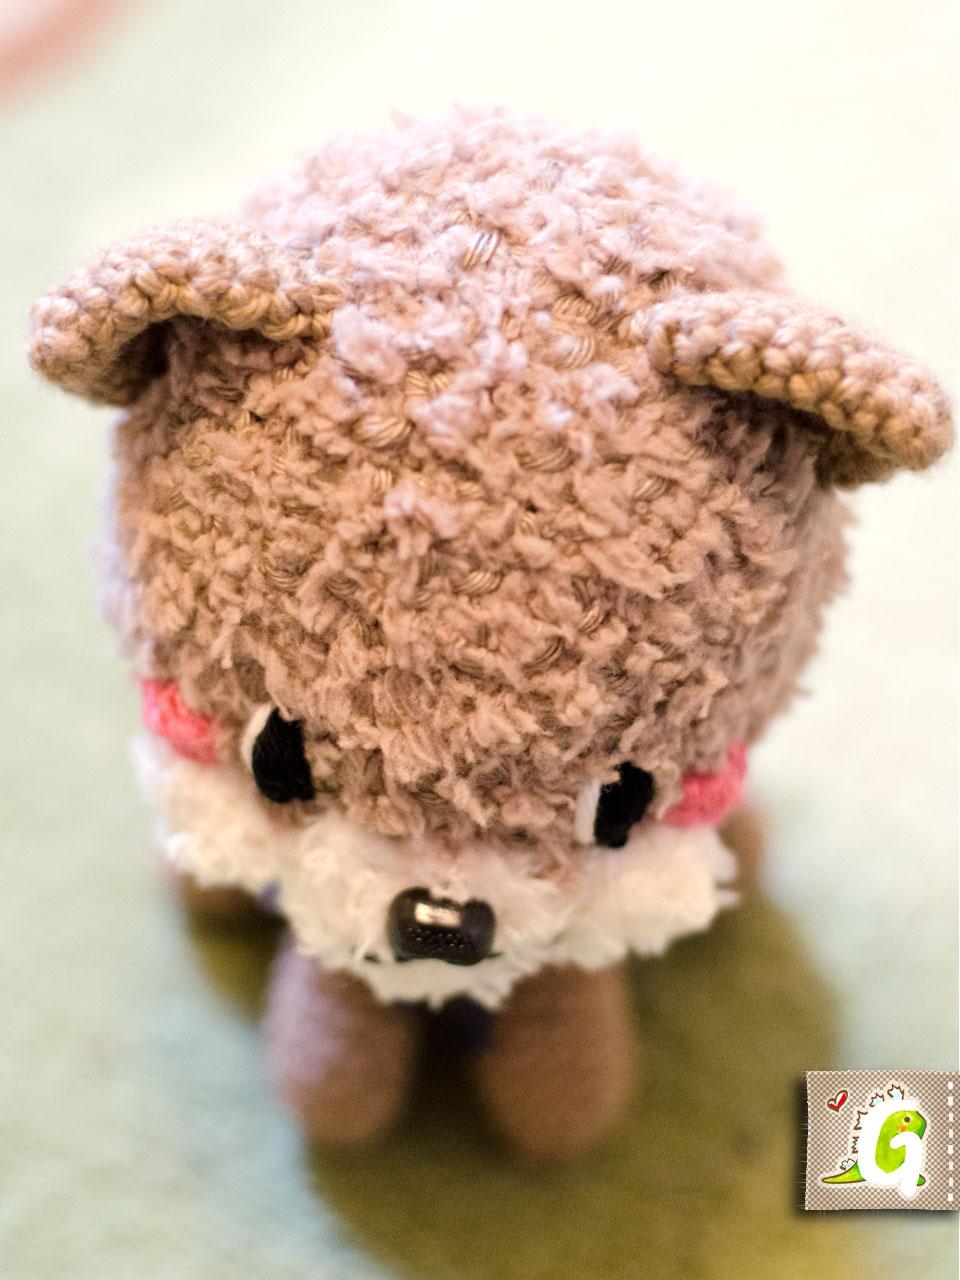 Urso Panda Amigurumi Em Crochê Grande - Sob Encomenda - R$ 110,00 ... | 1280x960